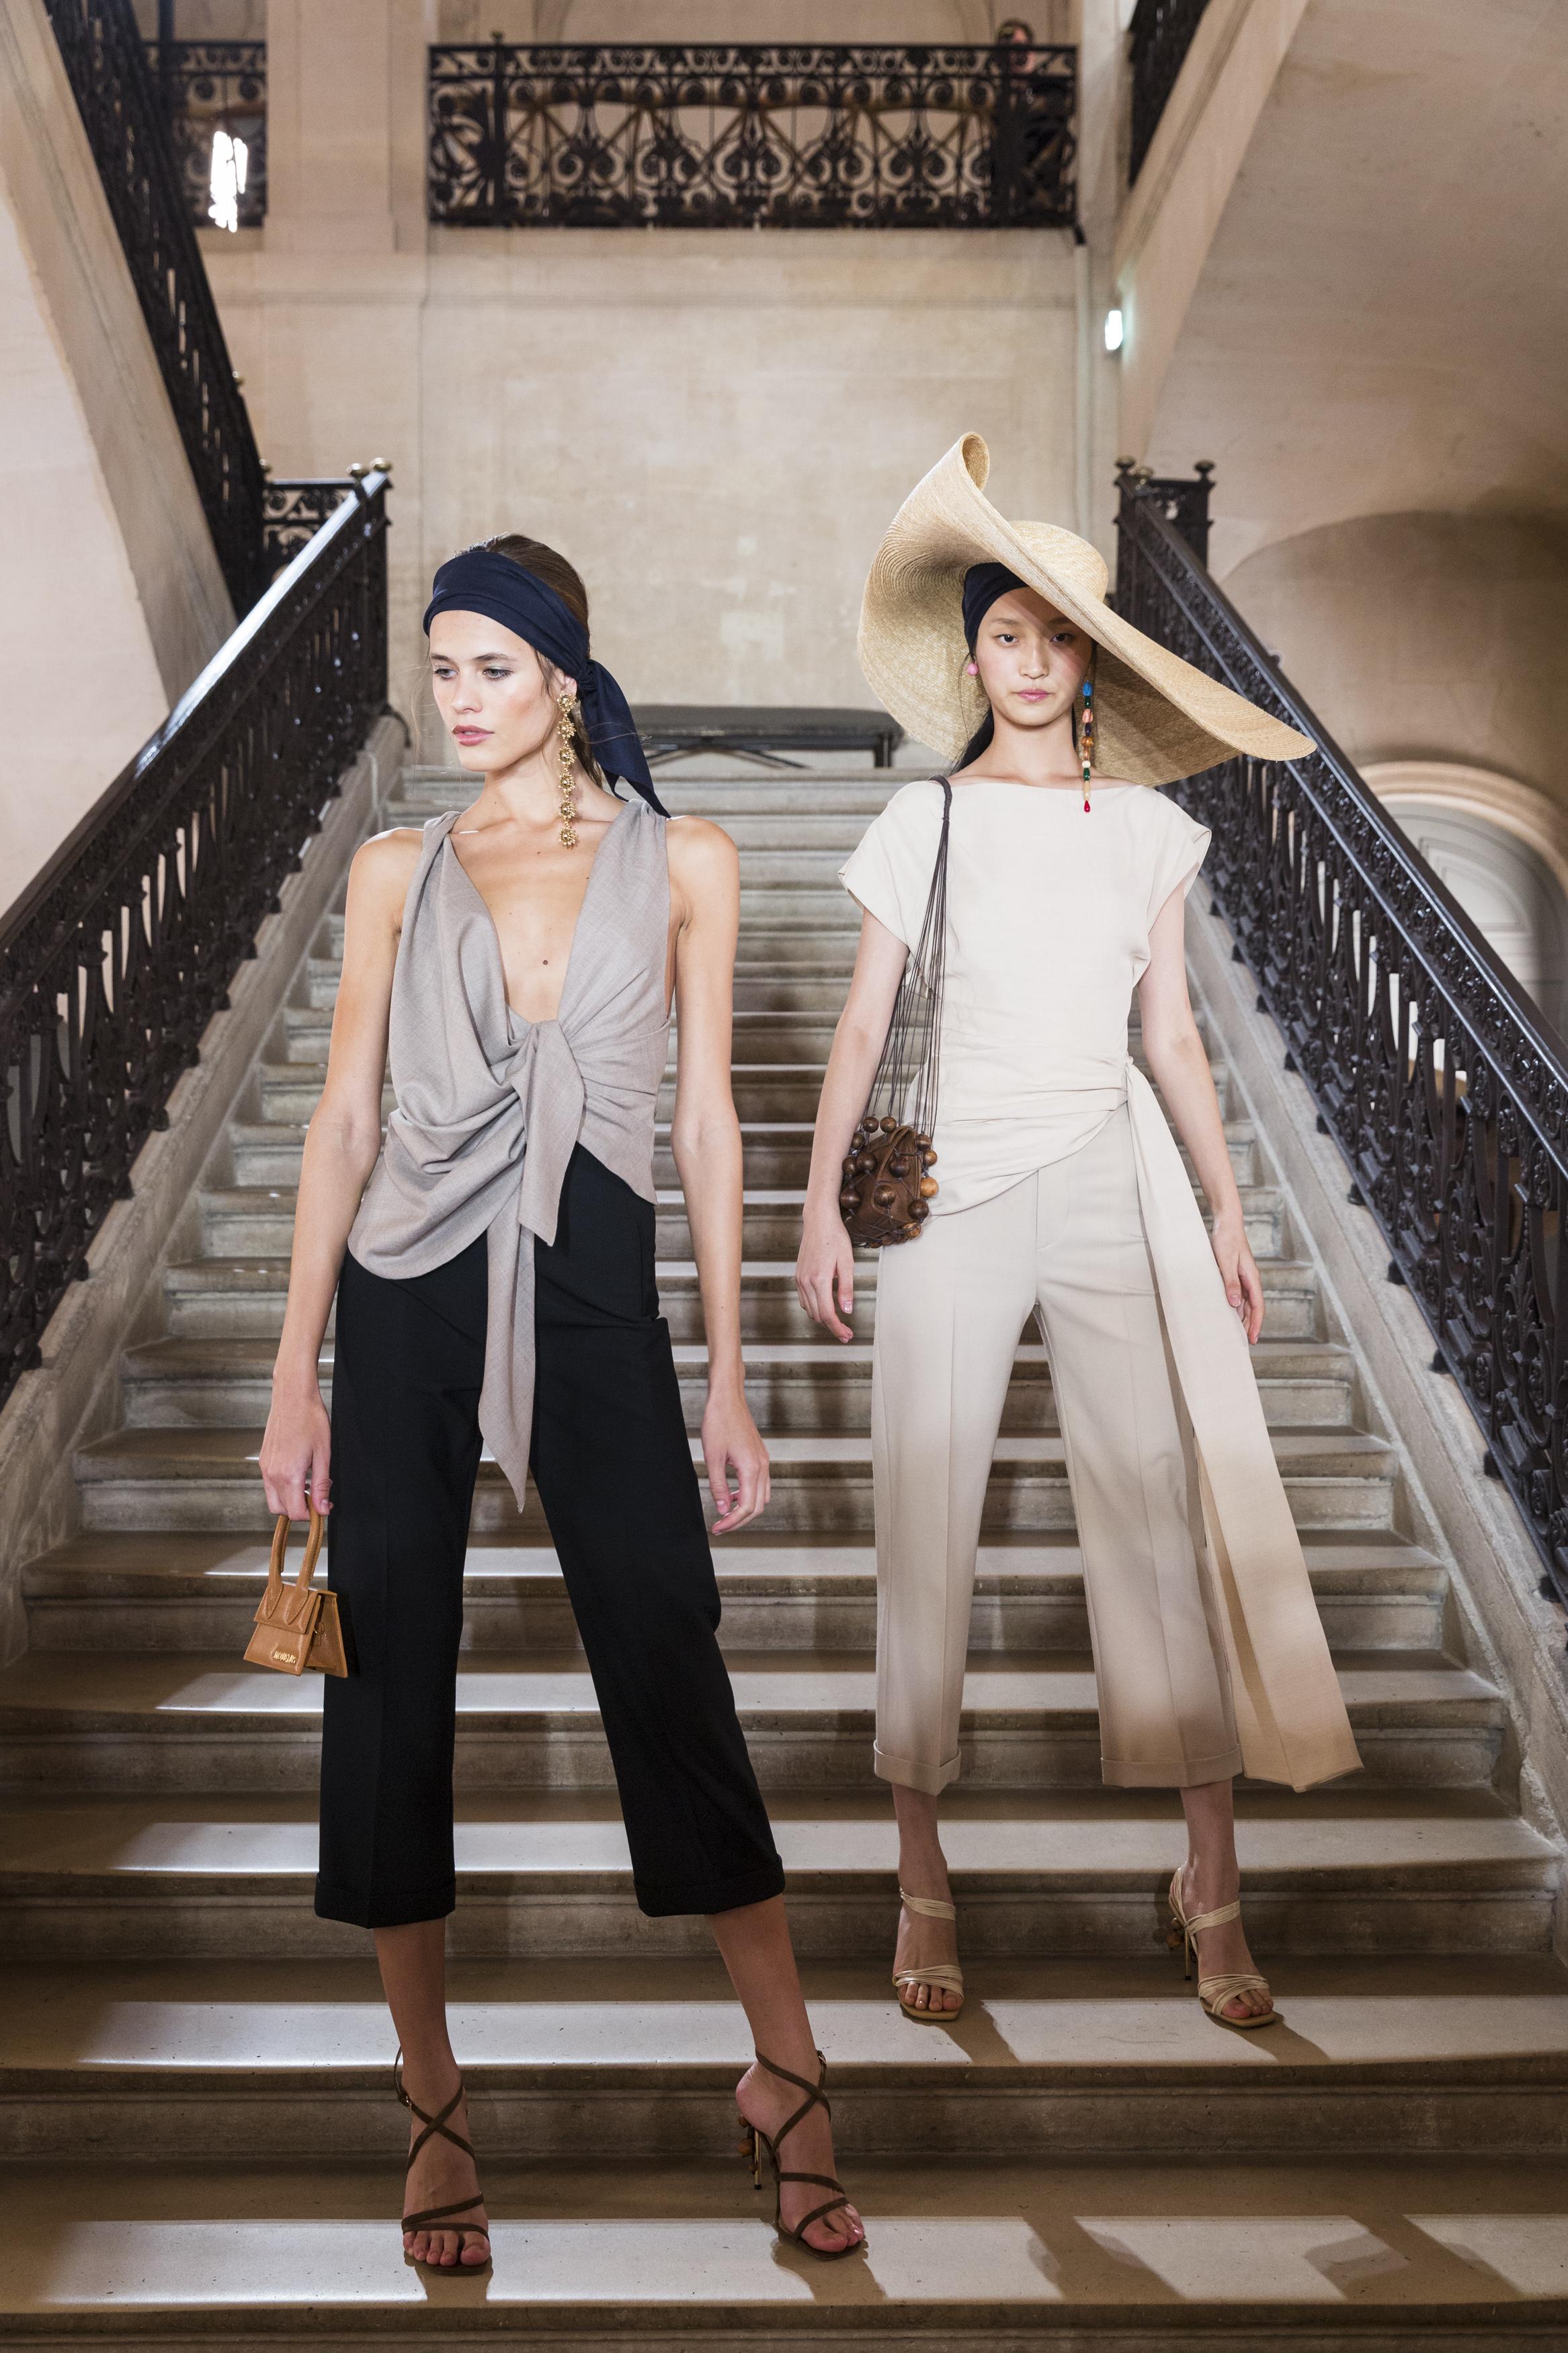 semana de la moda de paris, pasarela, diseñadores